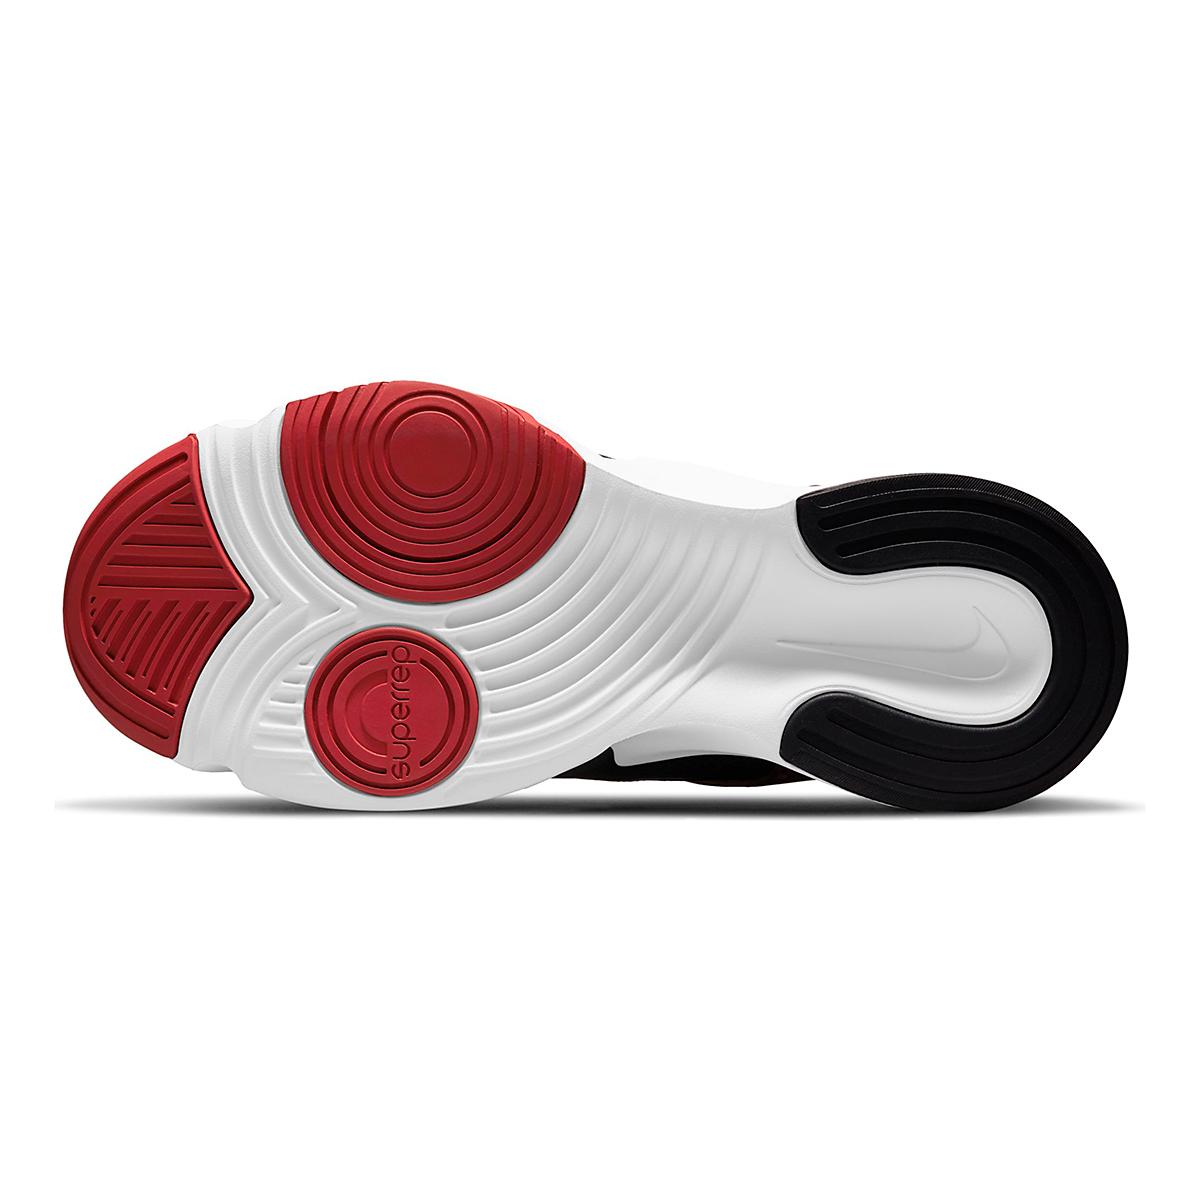 Men's Nike SuperRep Go 2 Training Shoe - Color: Black/White/Dark Cayenne/Solar Flare - Size: 6 - Width: Regular, Black/White/Dark Cayenne/Solar Flare, large, image 7